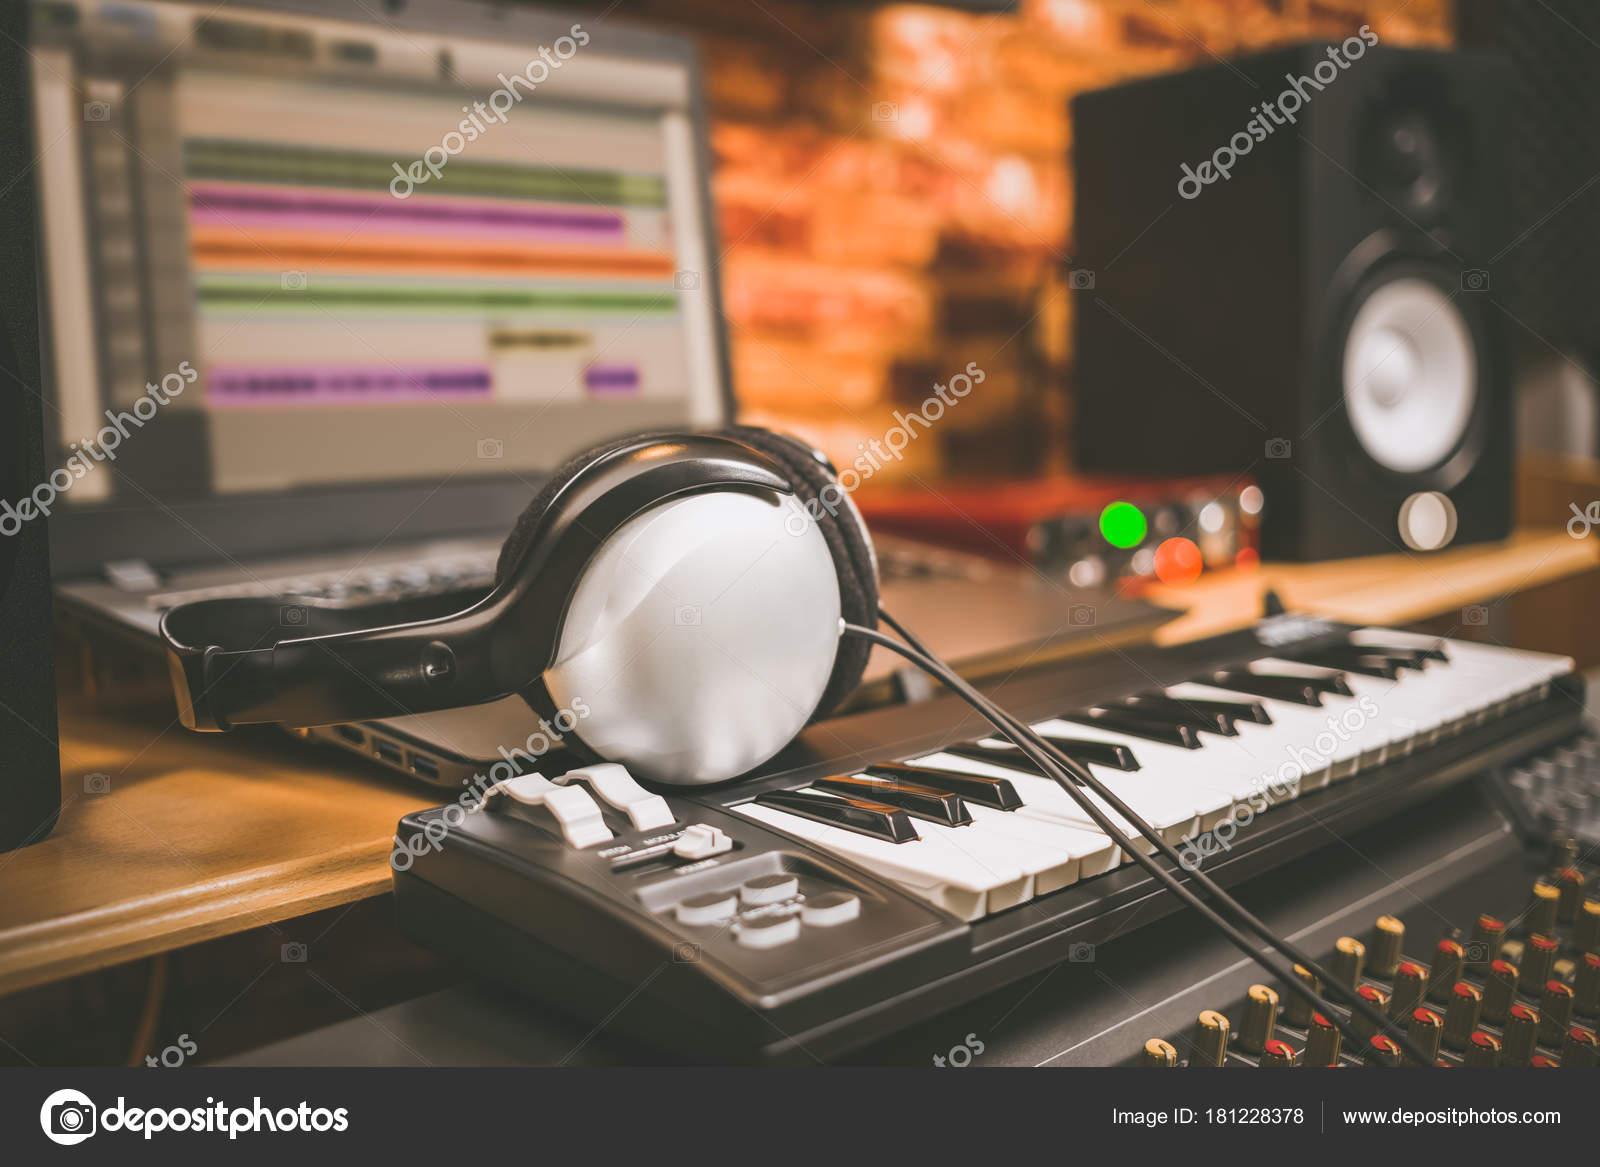 Computer Music Home Studio Equipment Headphone Midi Keyboard